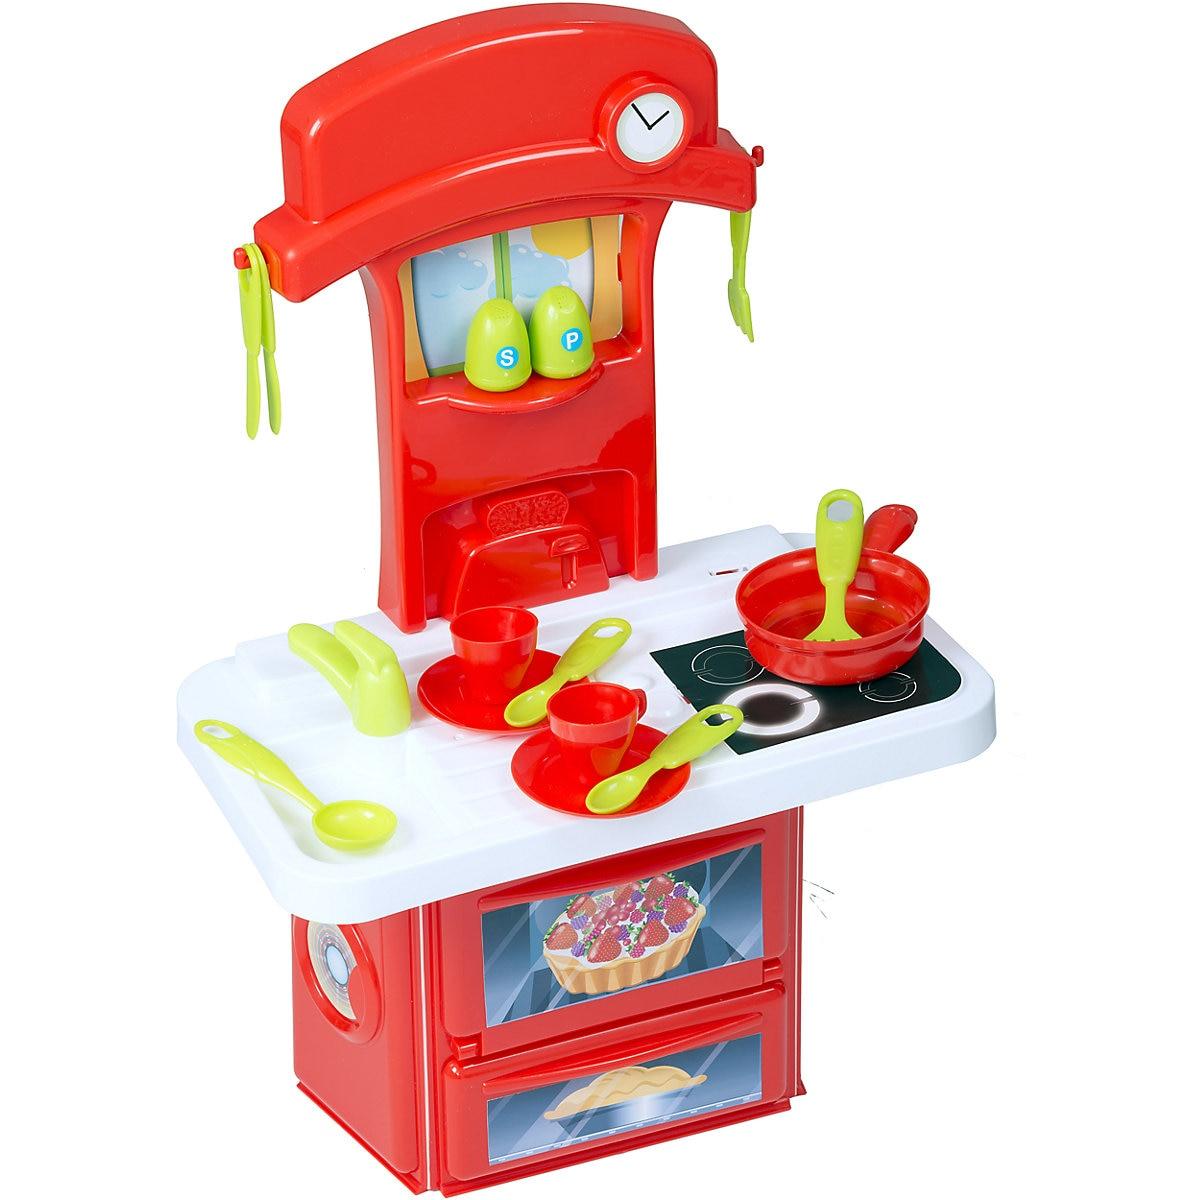 HTI Kitchen Toys10347061 Girls Vegetables Food Mini Tableware Game Play Toy Boy Girl